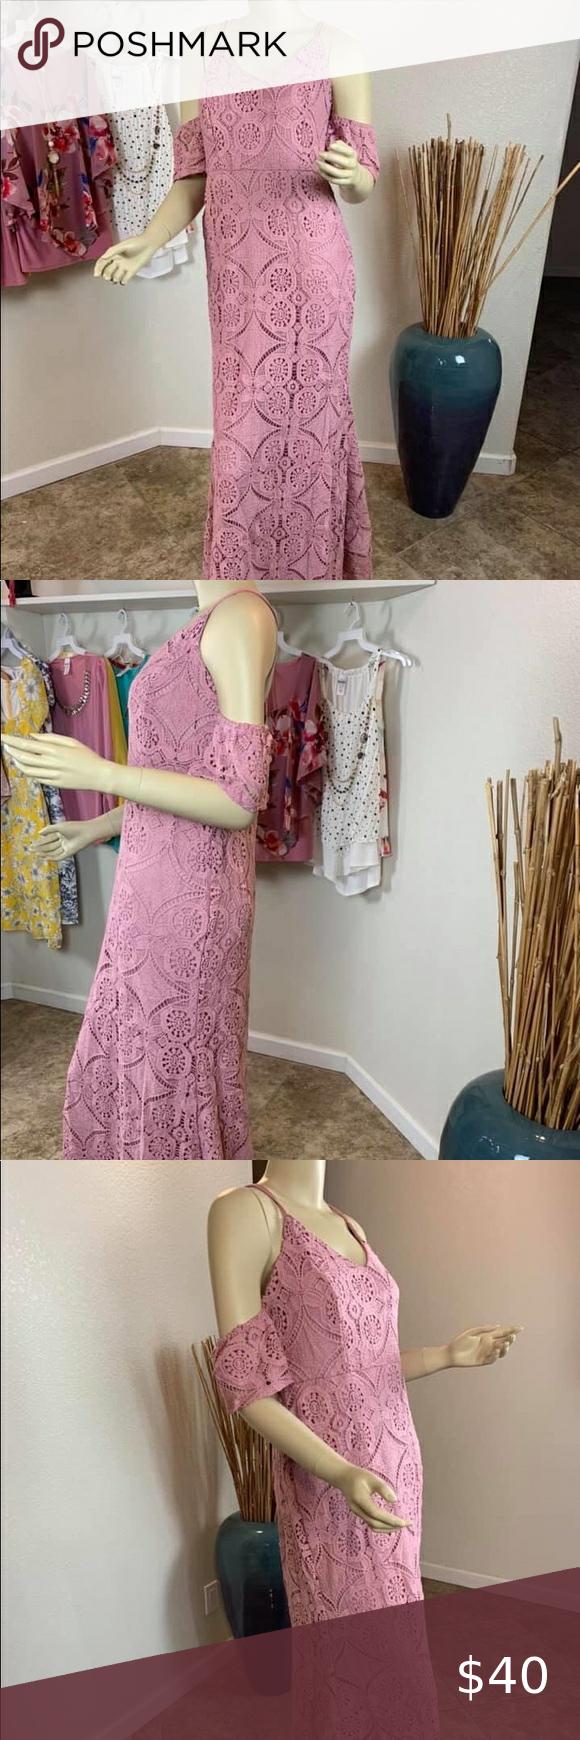 Summer Dress Summer Dresses Embroidered Maxi Dress Dresses [ 1740 x 580 Pixel ]